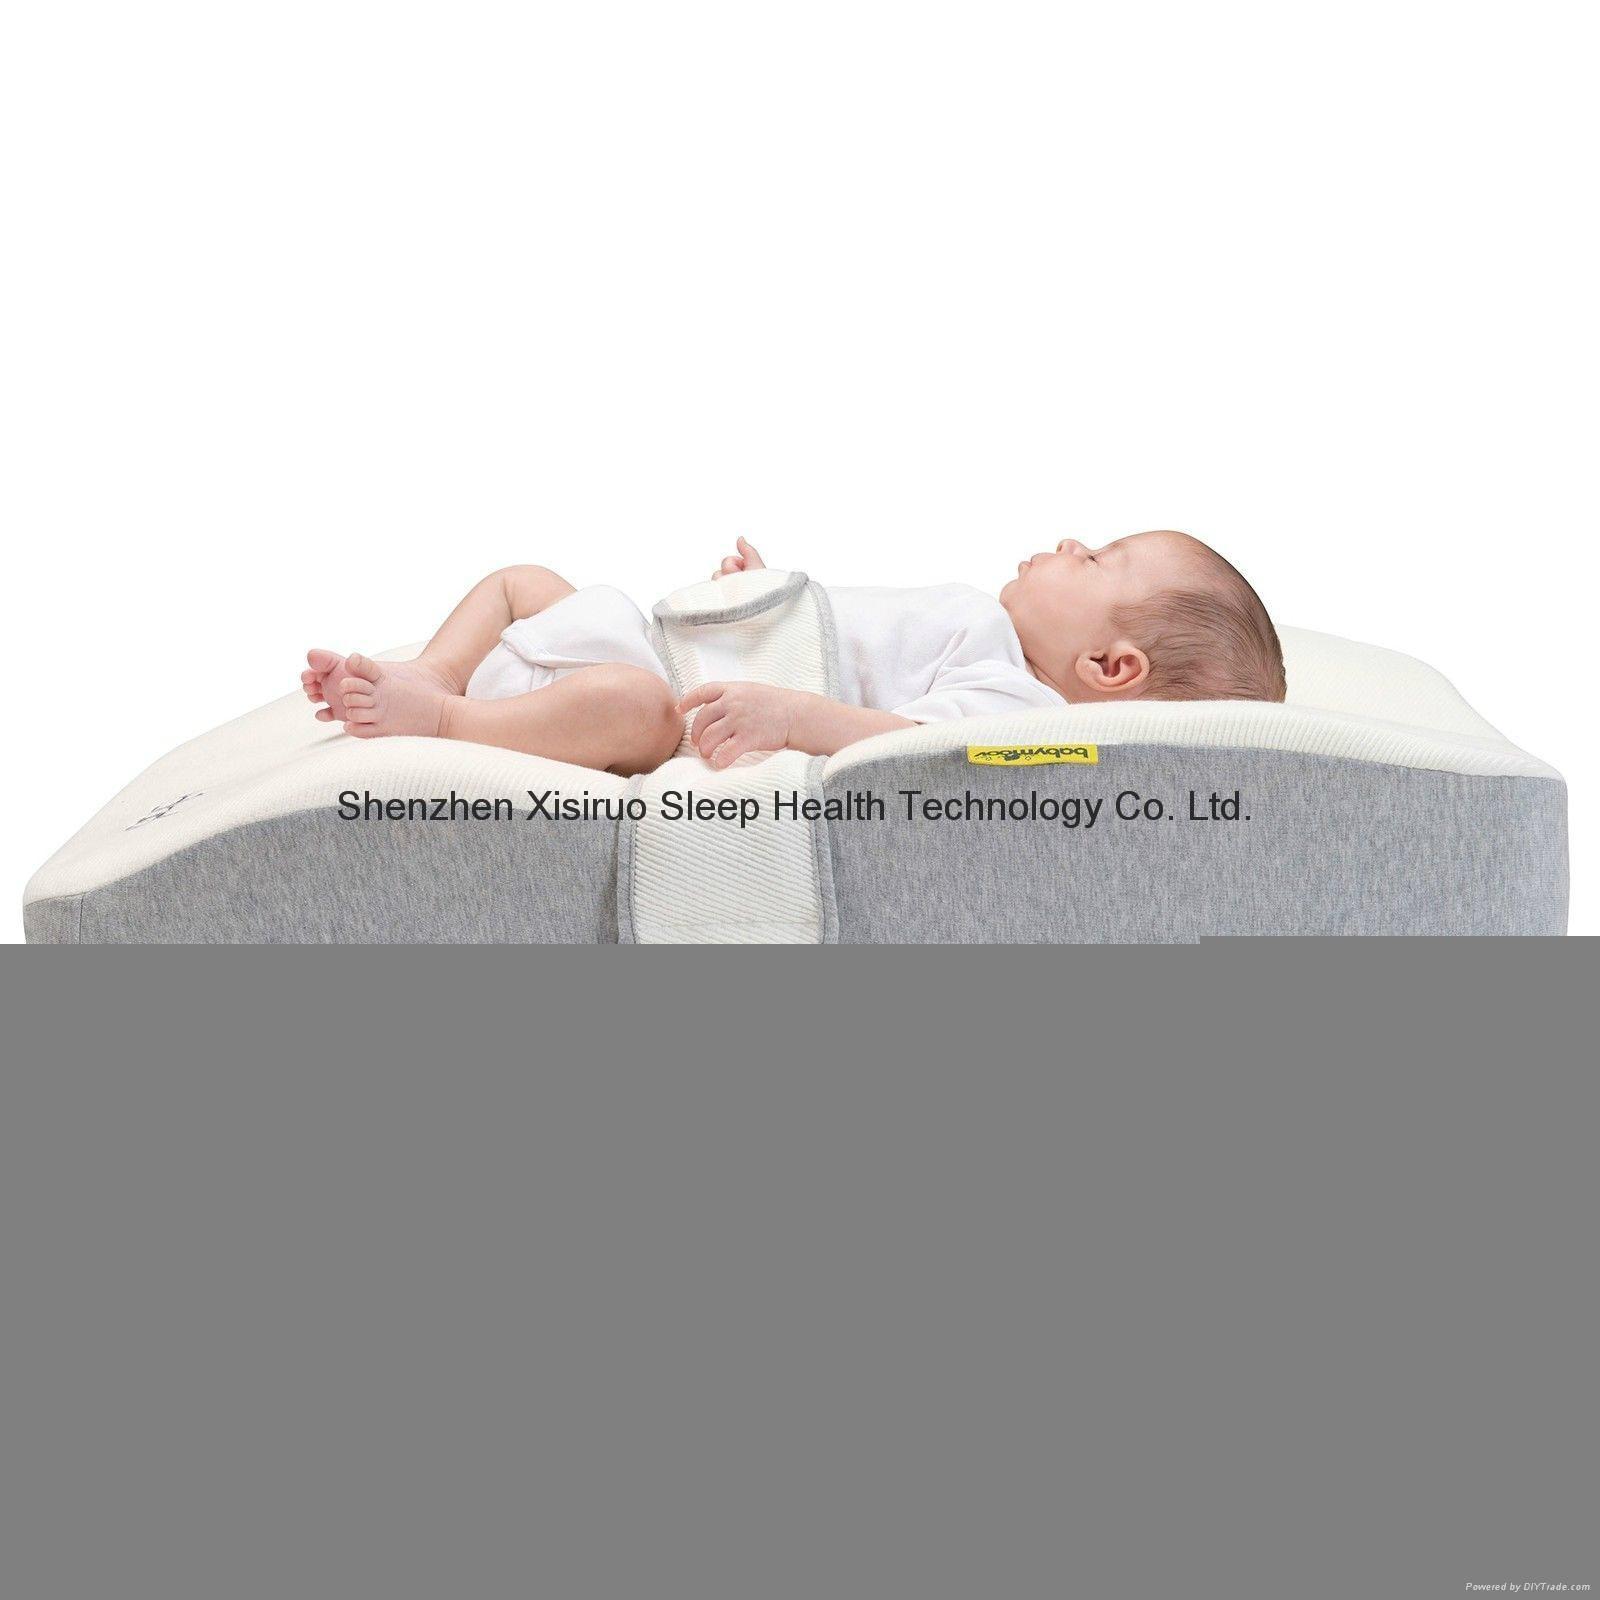 BabyChild Support Washable Memory Foam Travel Mattress  4